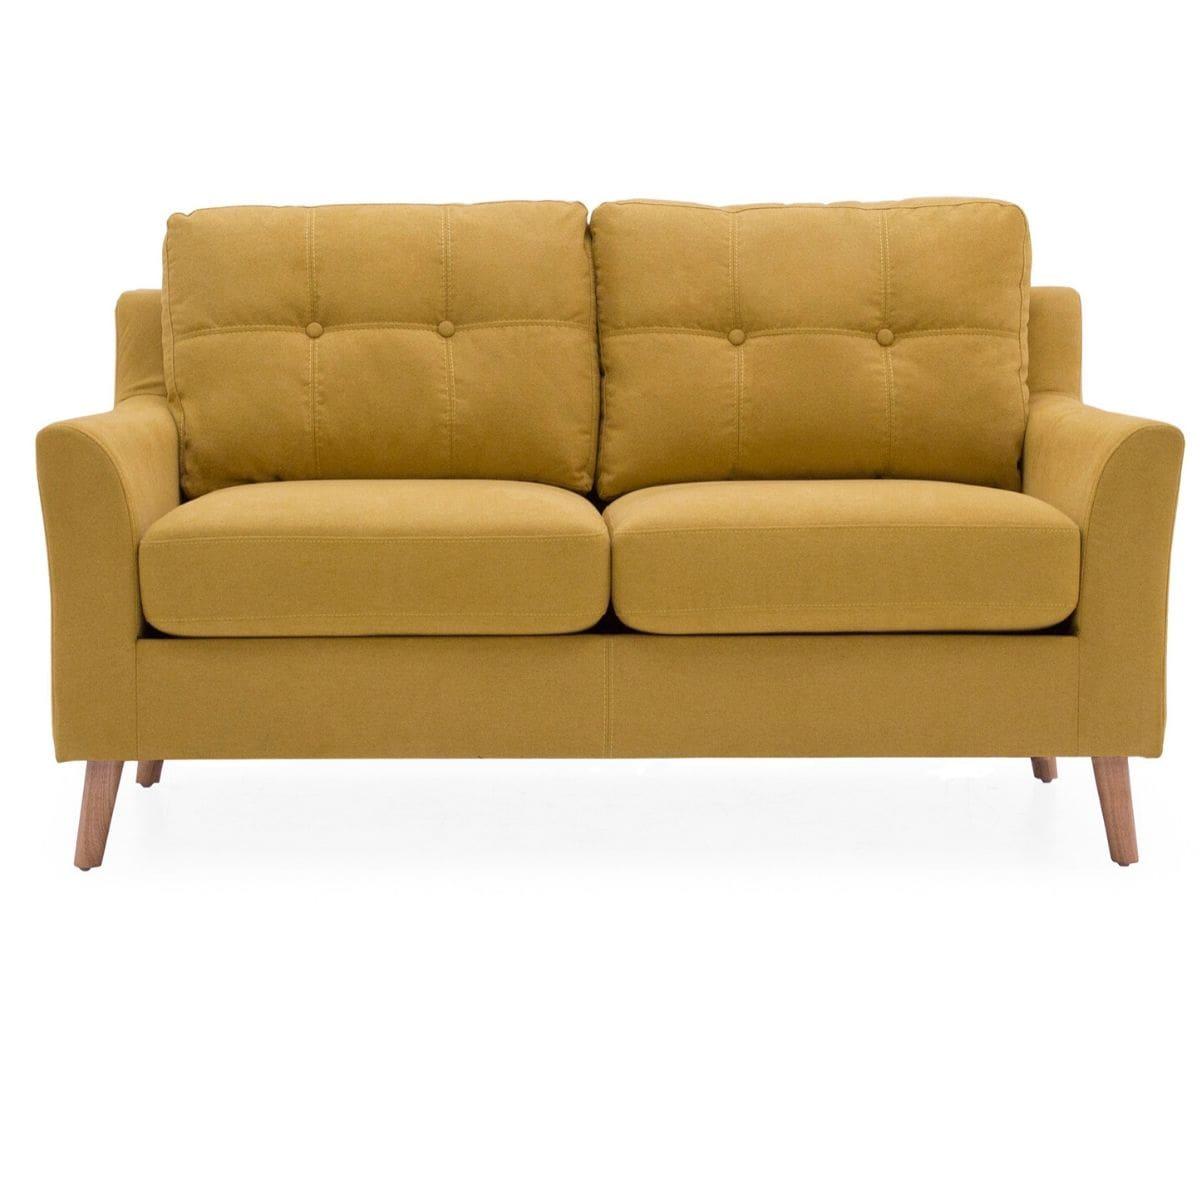 Olivia 2 Seater